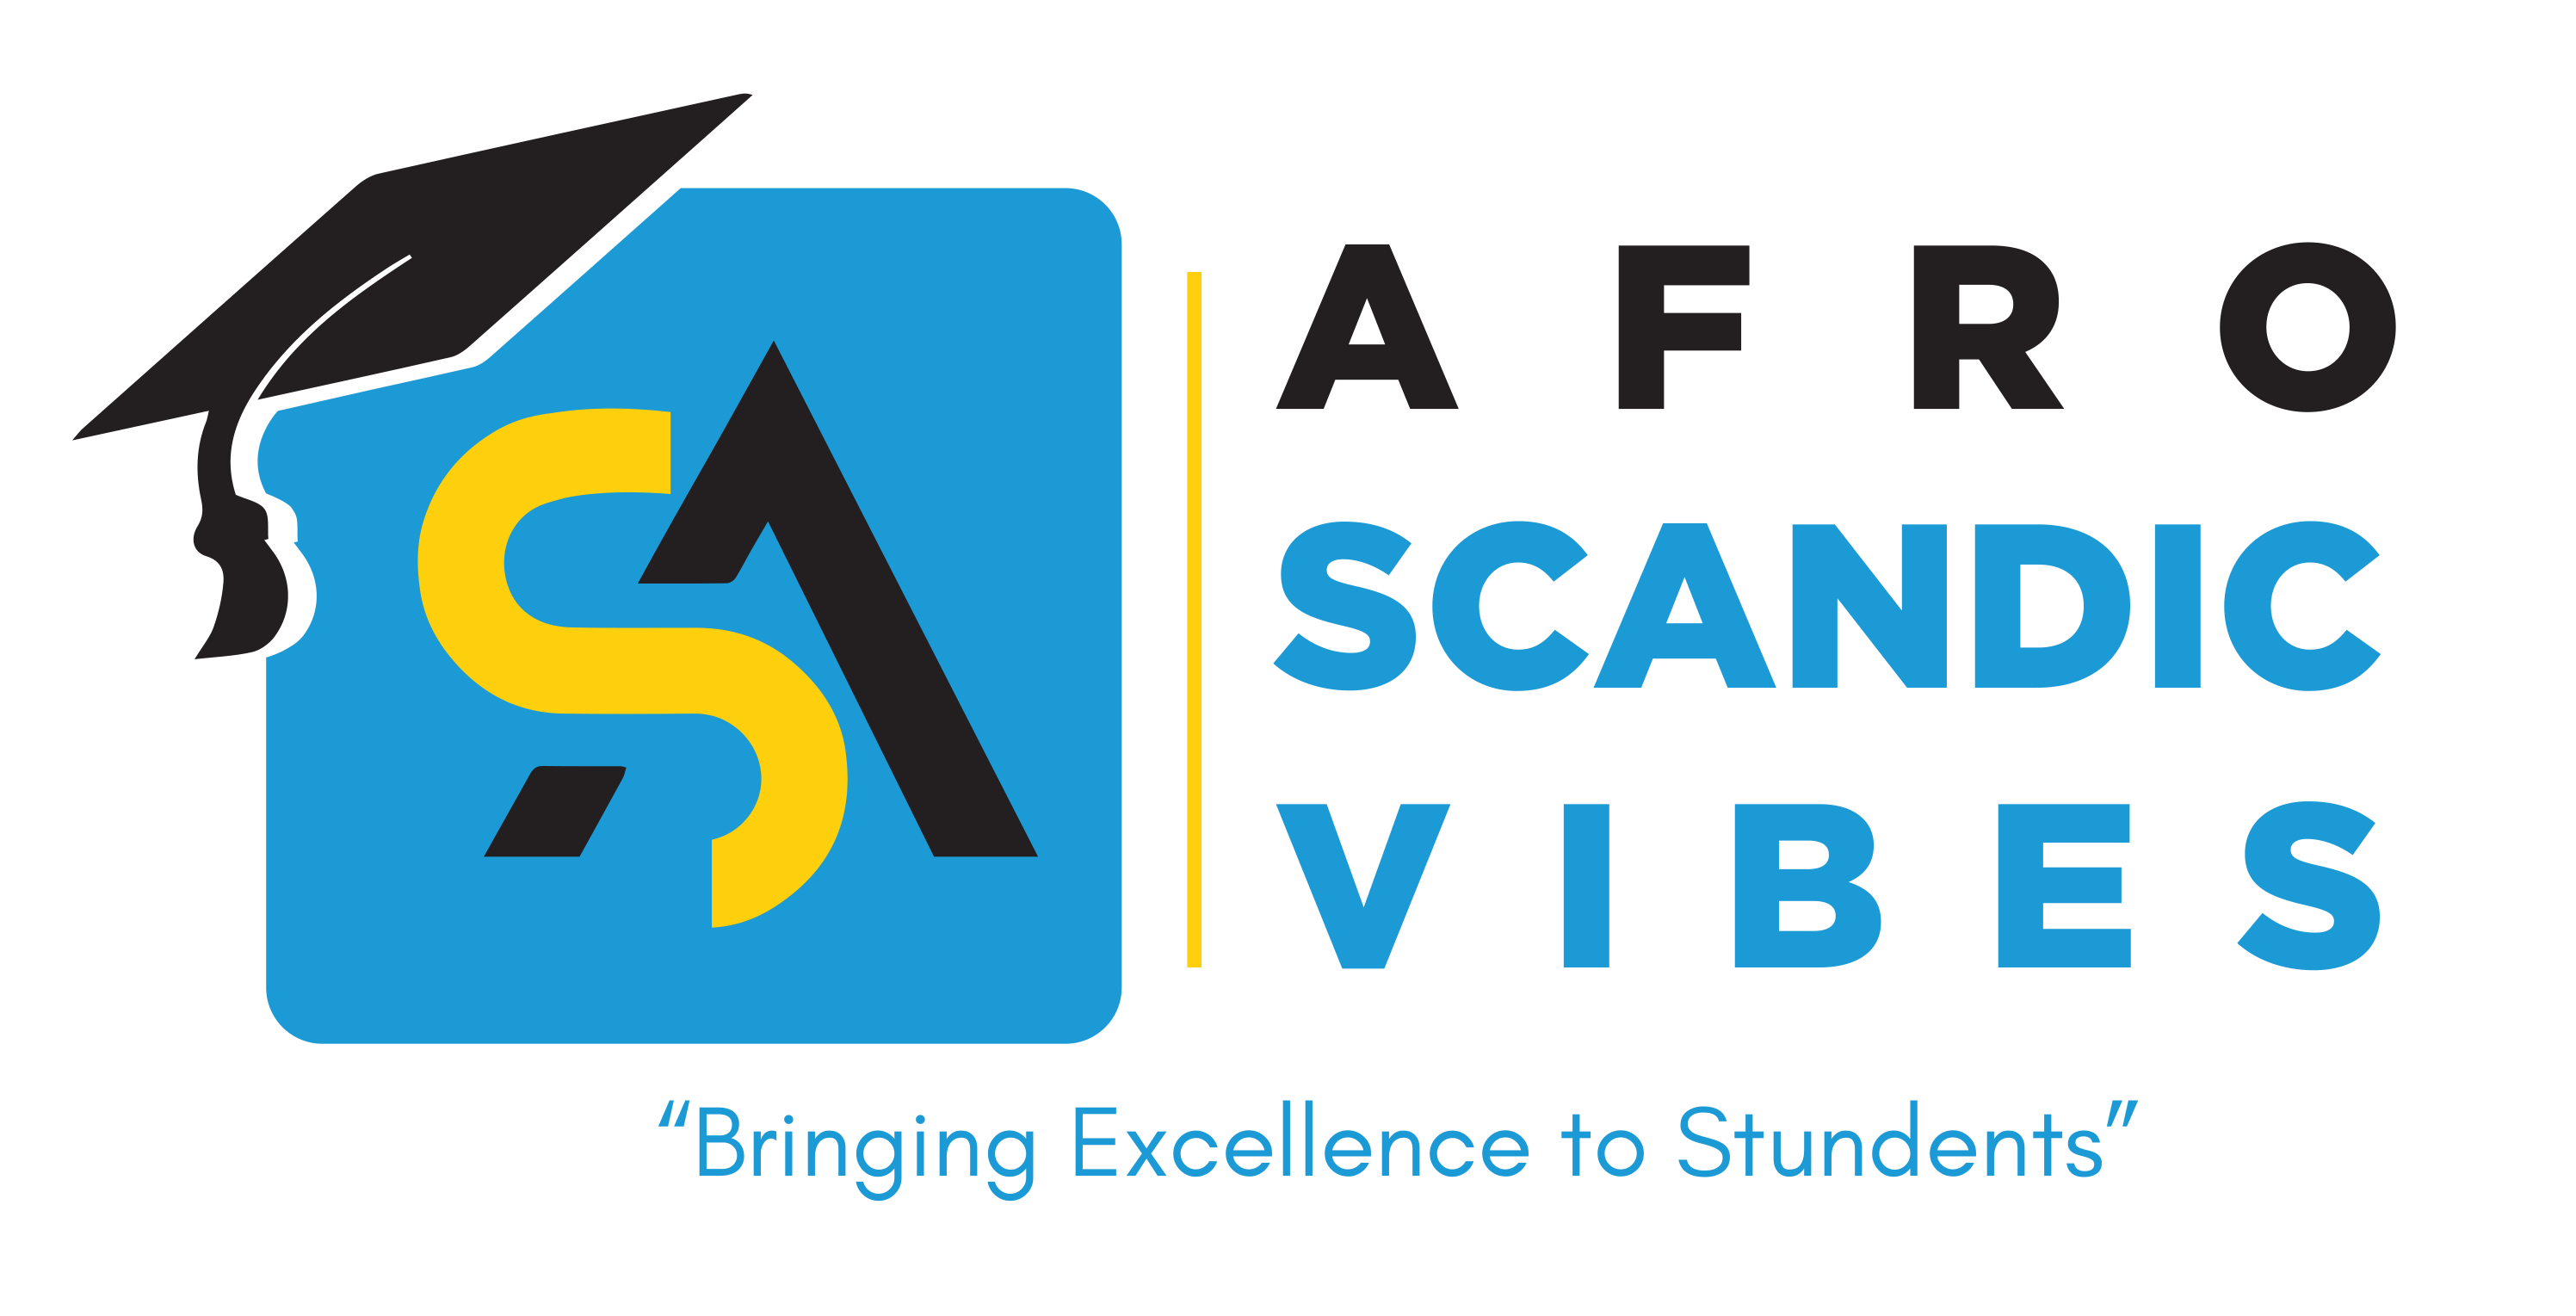 Afro Scandic Vibes AB